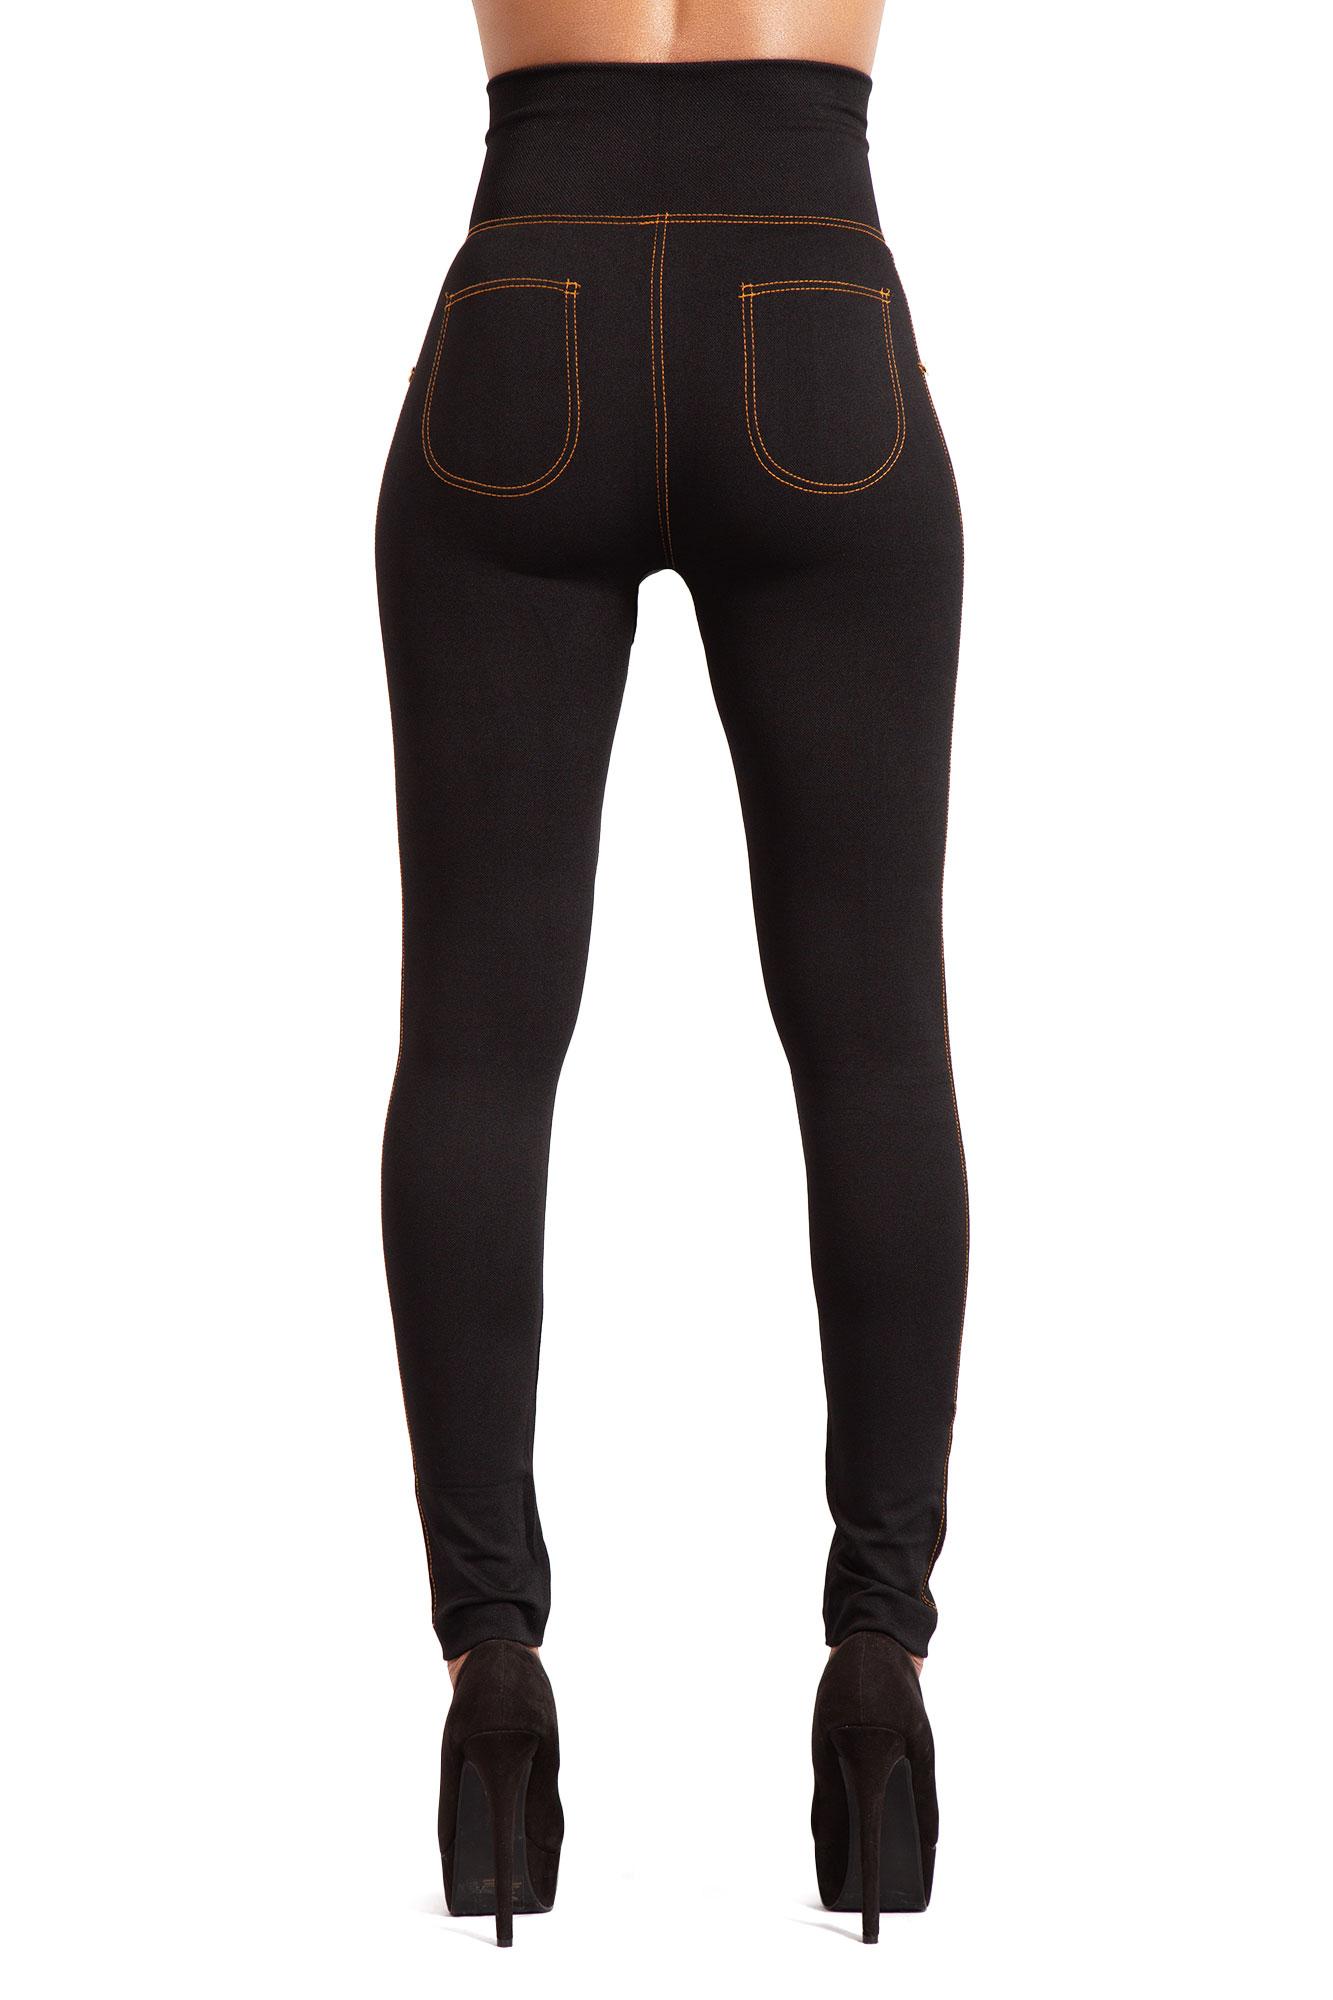 Women-High-Waist-Black-Leggings-Ladies-Print-Jeggings-Style-Trousers thumbnail 14